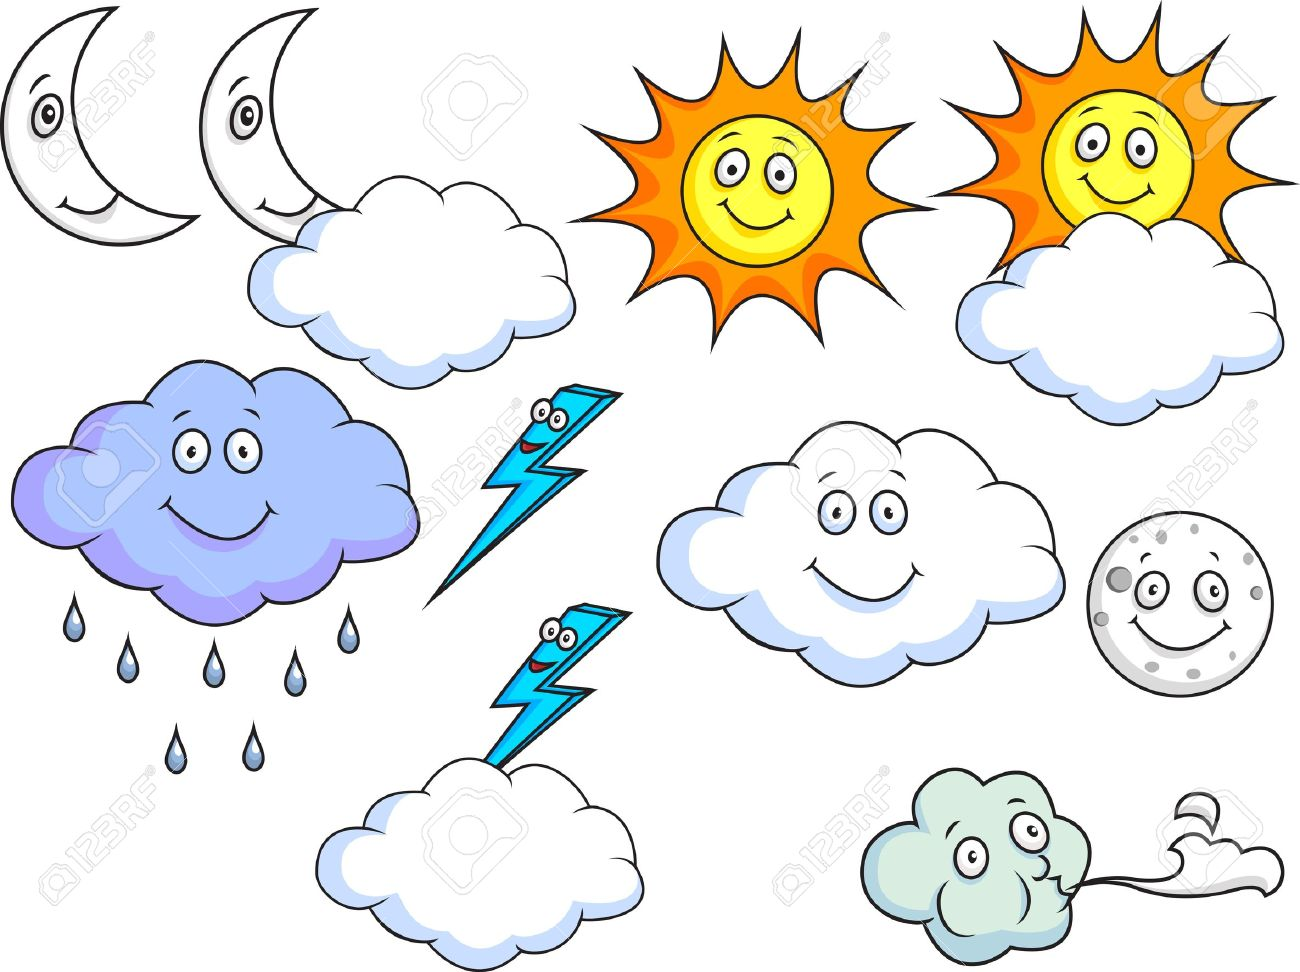 Cartoon Weather Symbols - 15234278